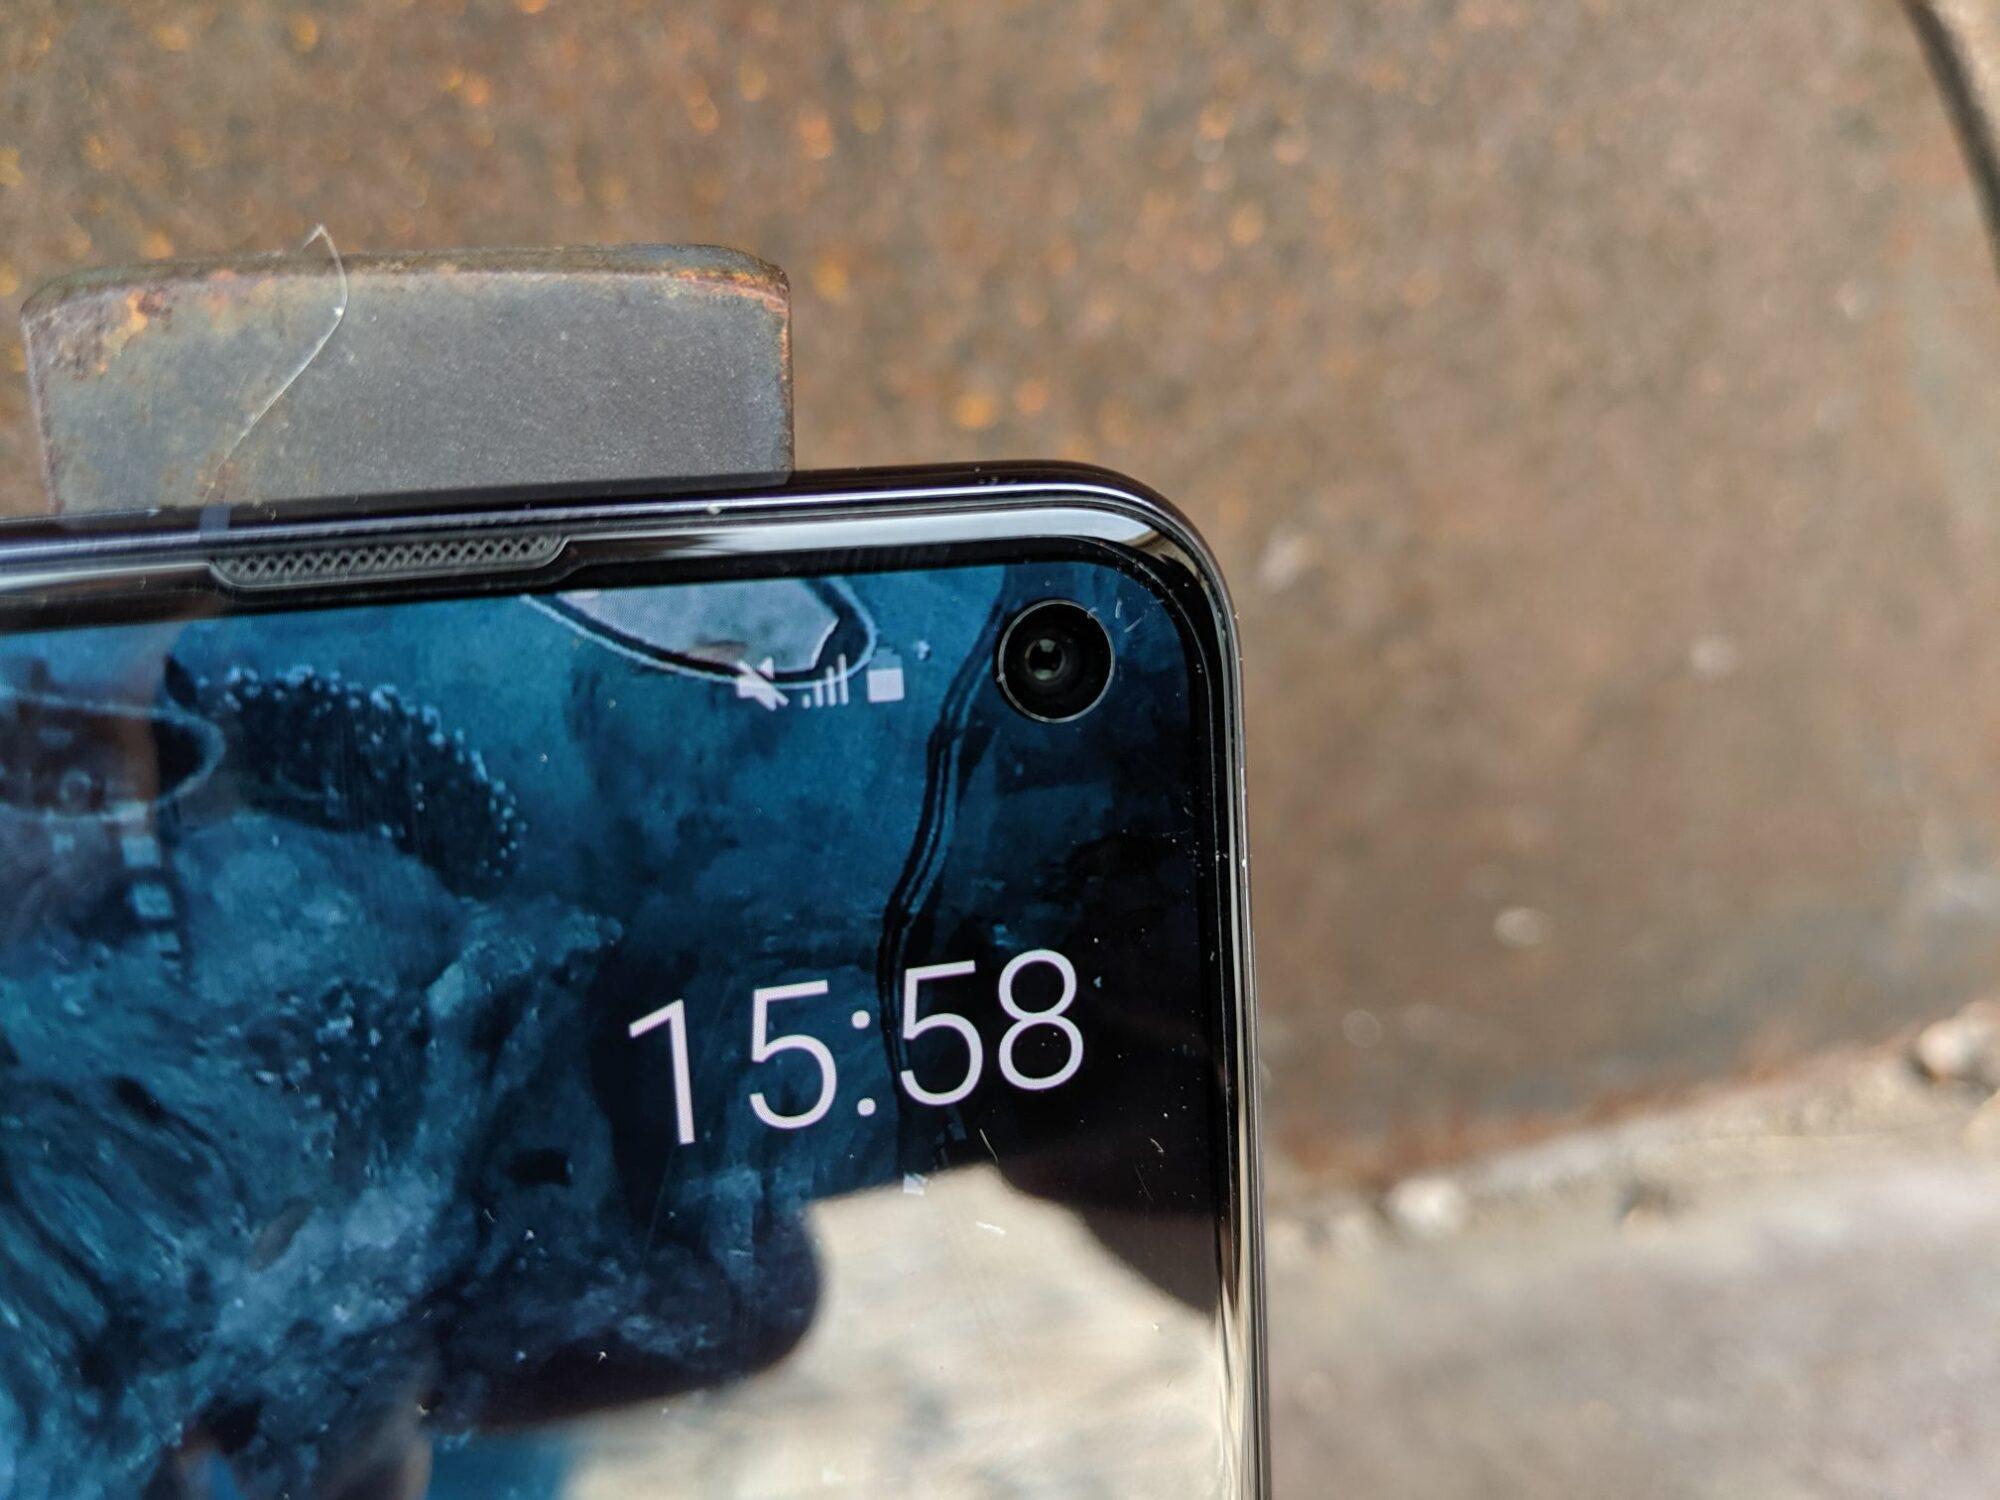 S10e, Samsung Galaxy S10e, Samsung S10e